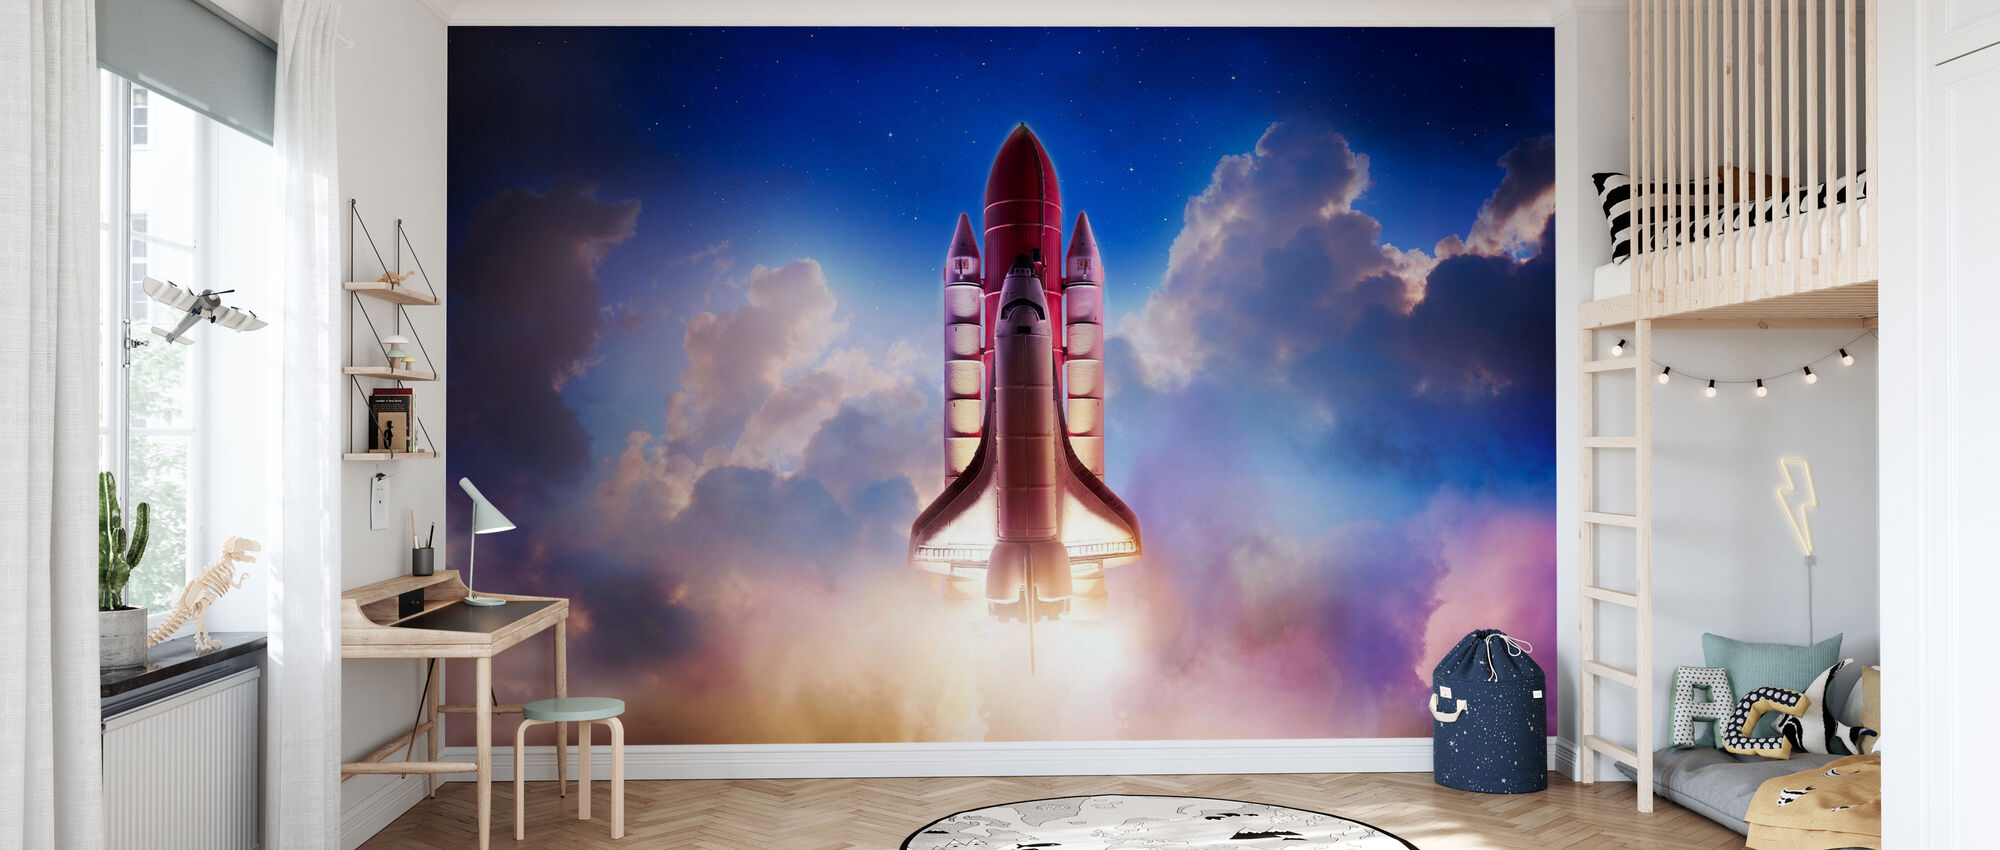 Dragkraft ut i rymden - Tapet - Barnrum